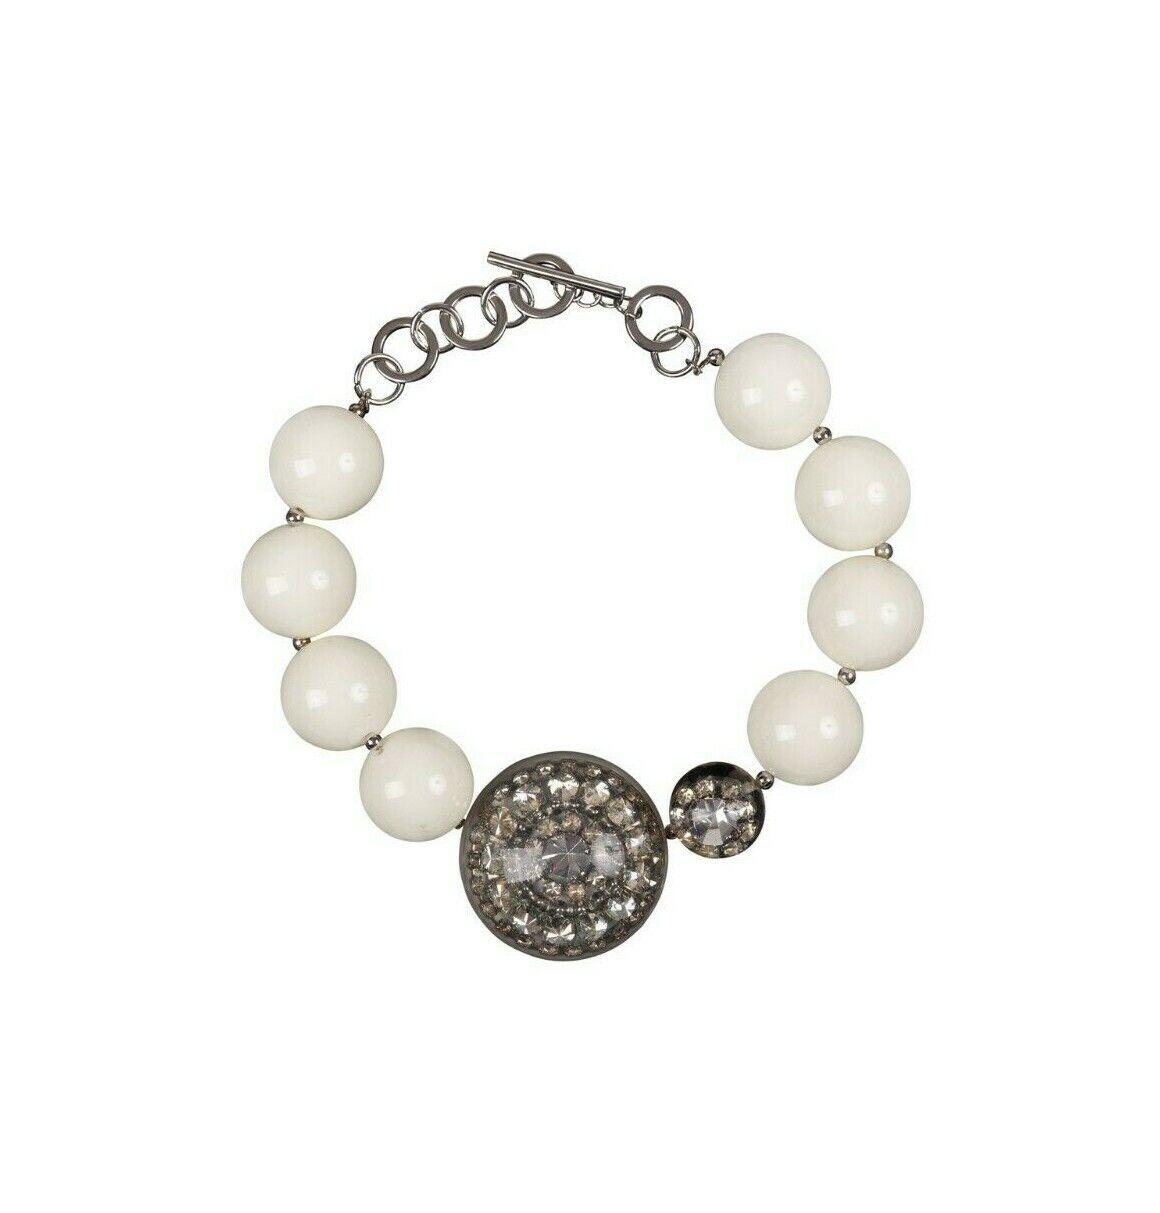 EMPORIO ARMANI Jewels Brass + Glass + Poly Ivory Balls Necklace Woman